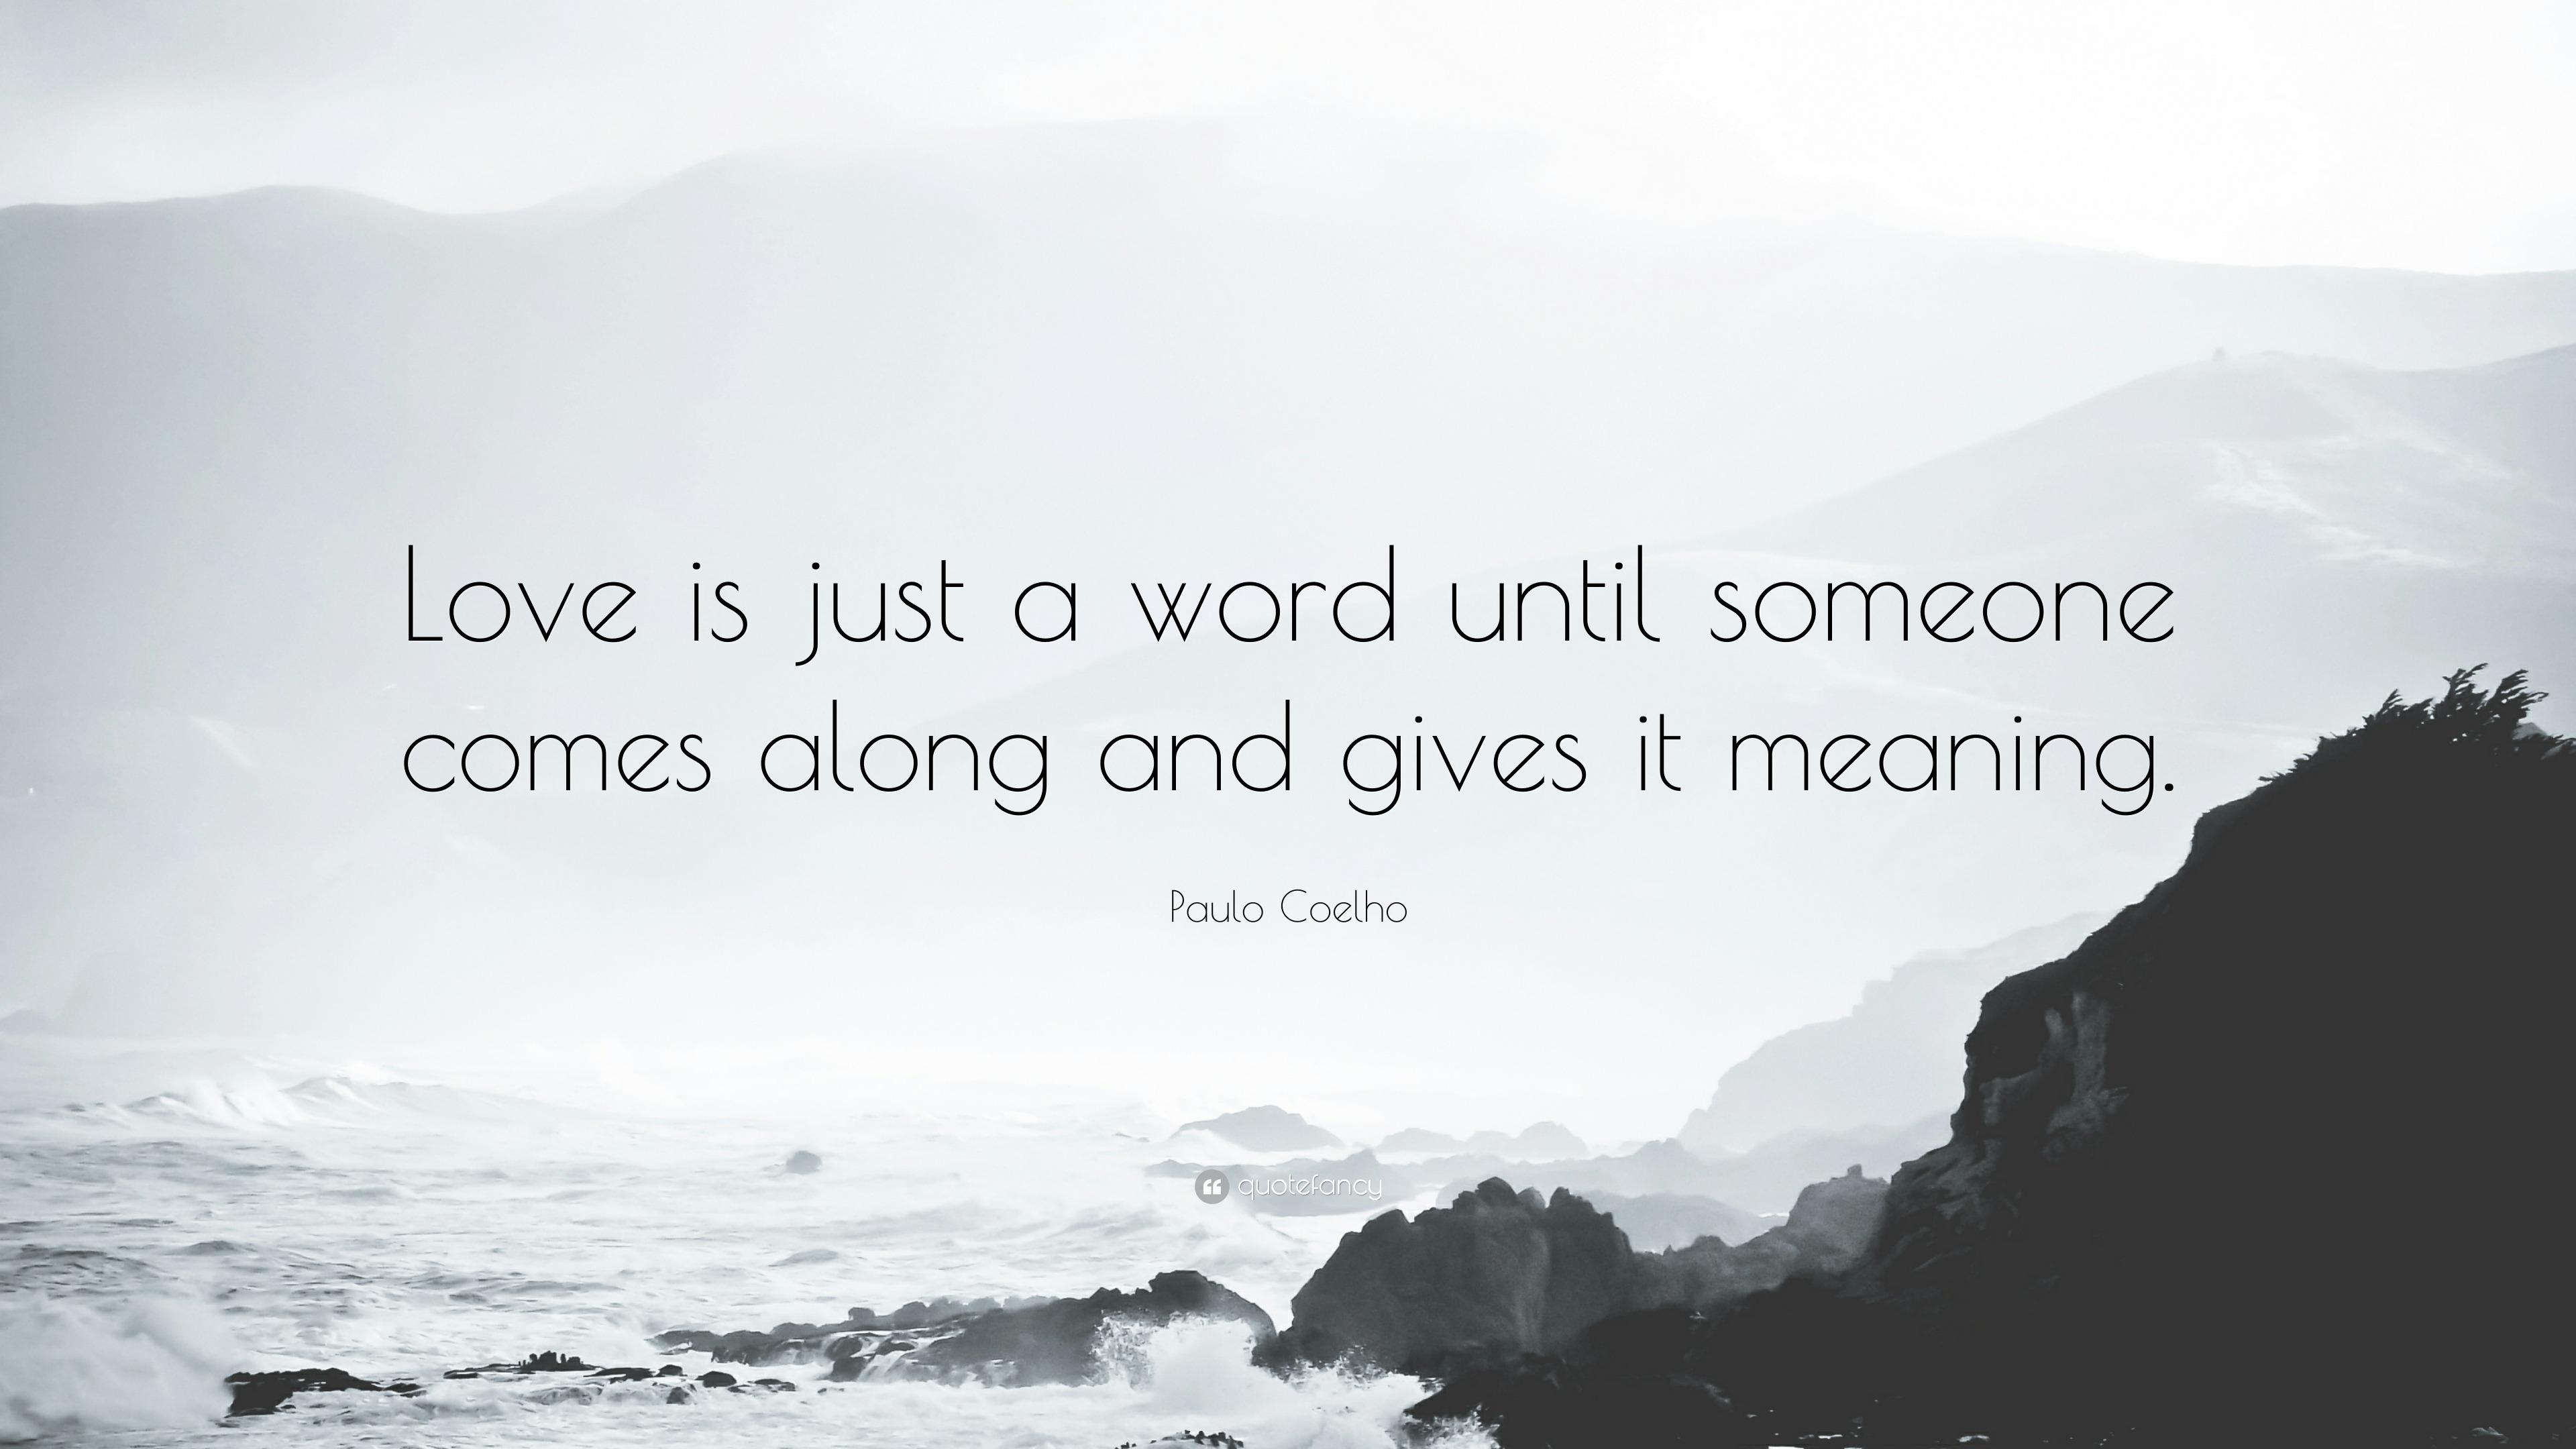 Paulo Coelho Quotes (100 wallpapers) - Quotefancy